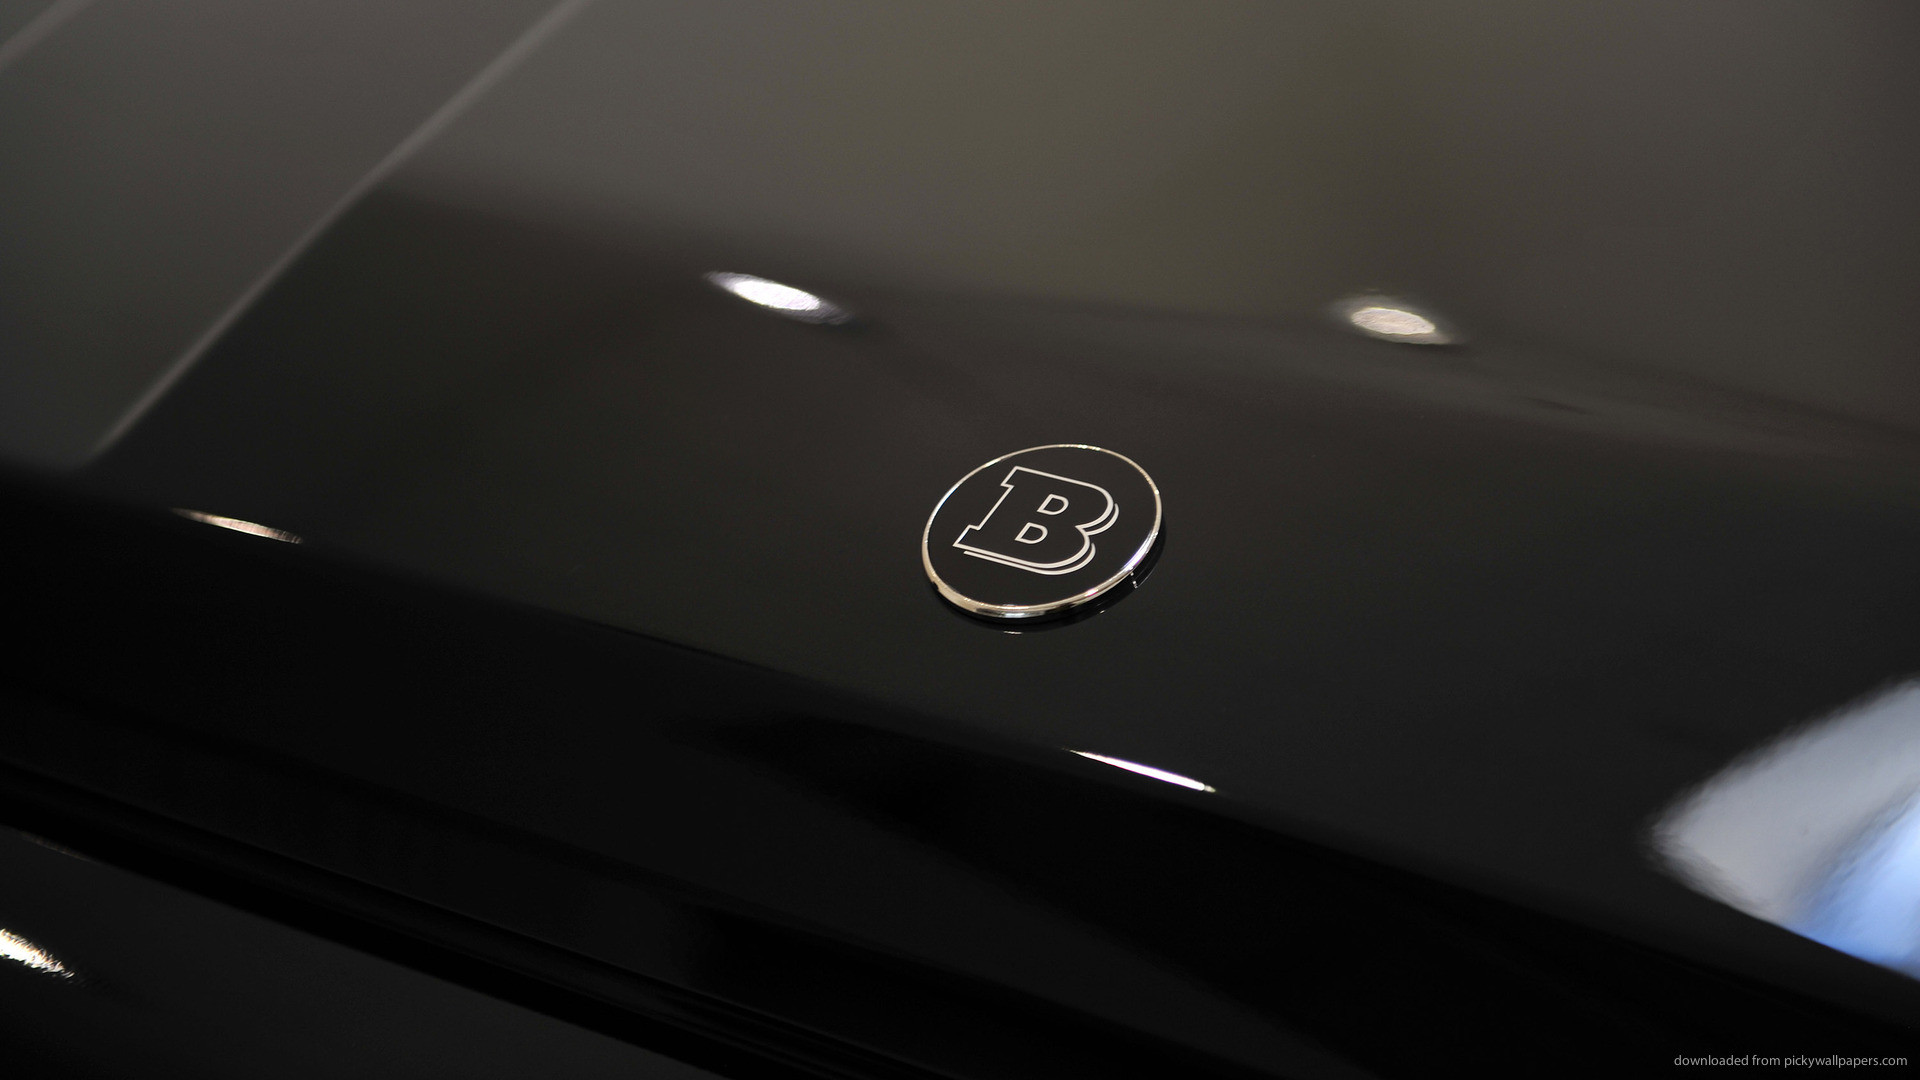 Brabus Mercedes G 63 AMG Brabus Logo picture